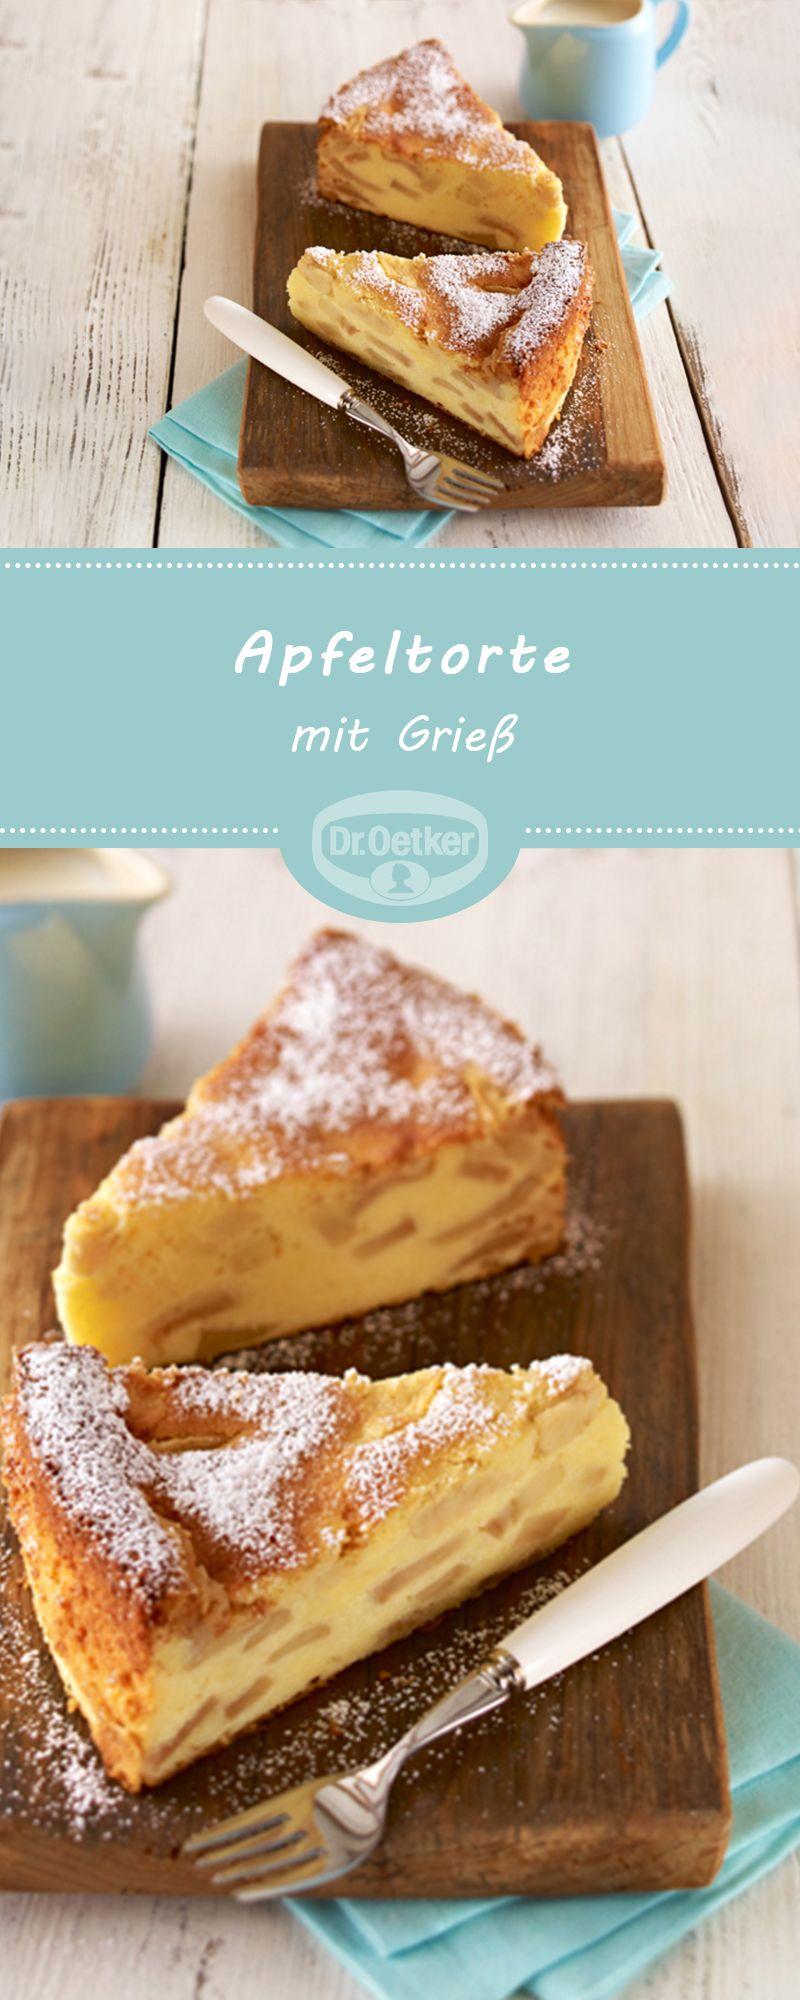 Photo of Apple pie with semolina